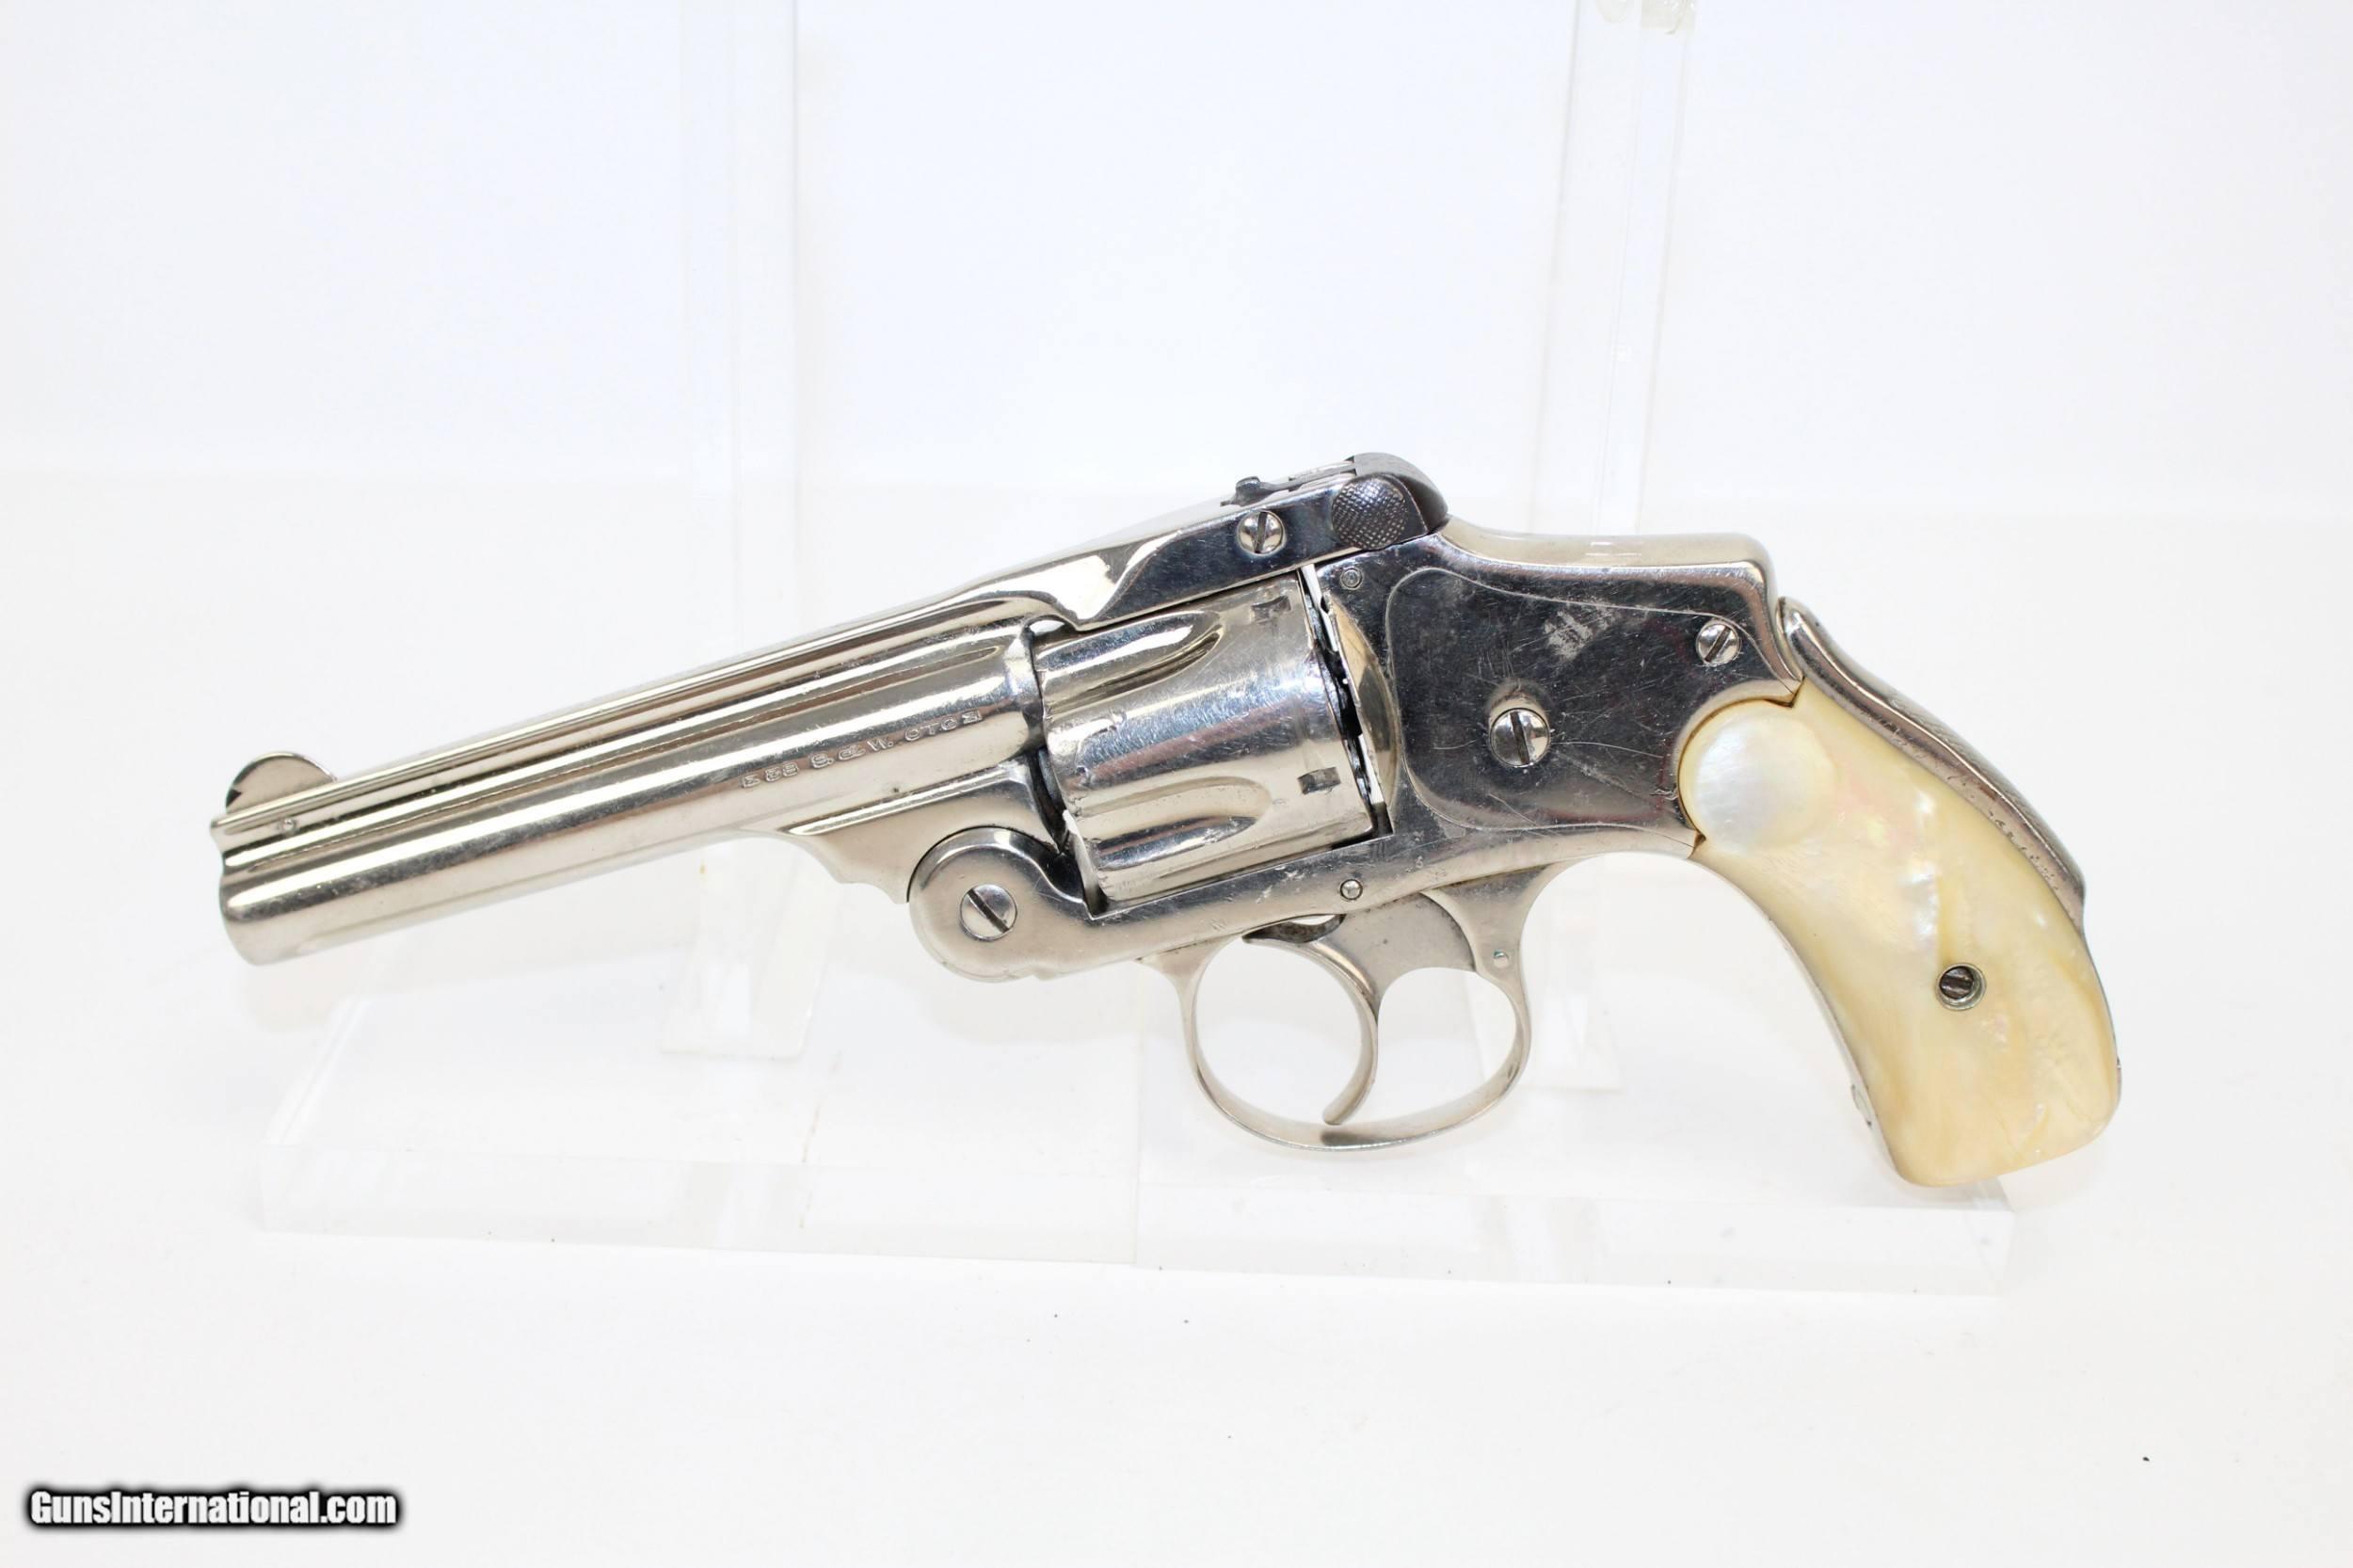 S&W  38 Safety Hammerless 4th Model Revolver